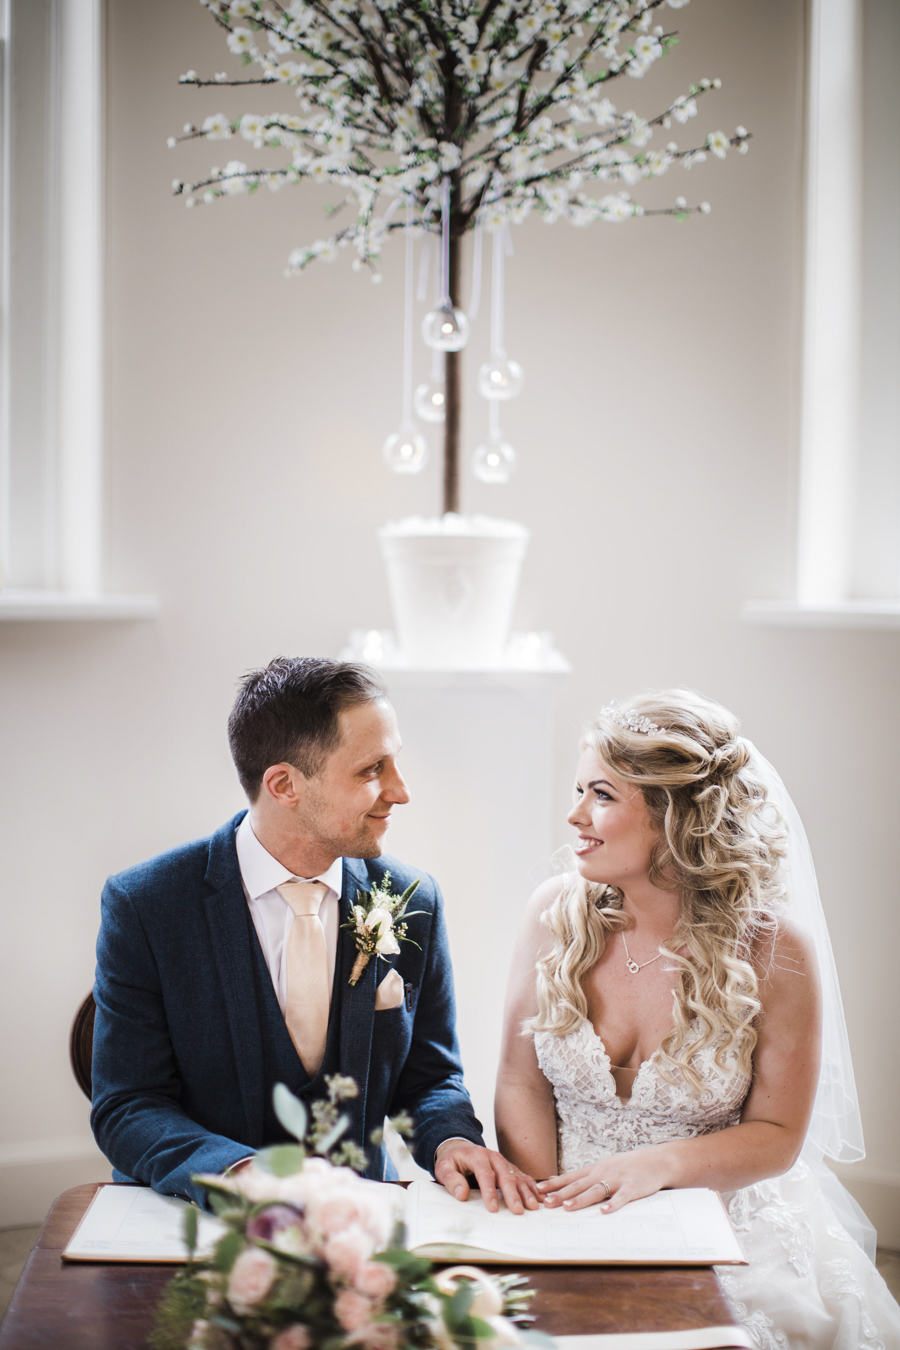 Rachel & Ben's beautiful Iscoyd Park wedding with Anna Beth Photography (20)